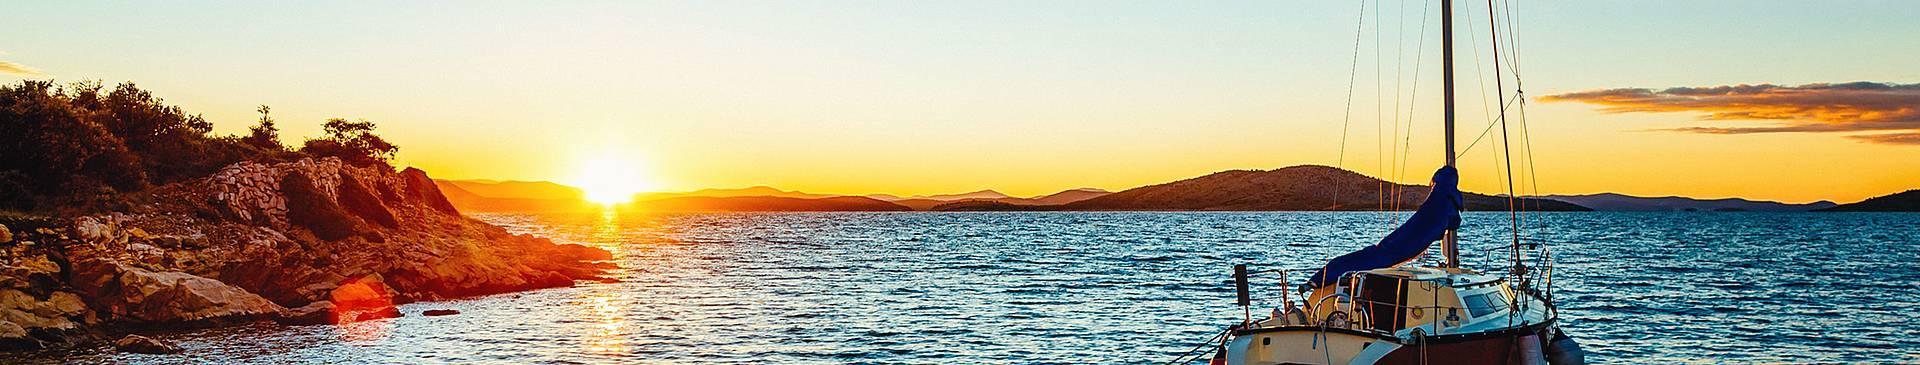 Croisière et Balade en bateau en Croatie